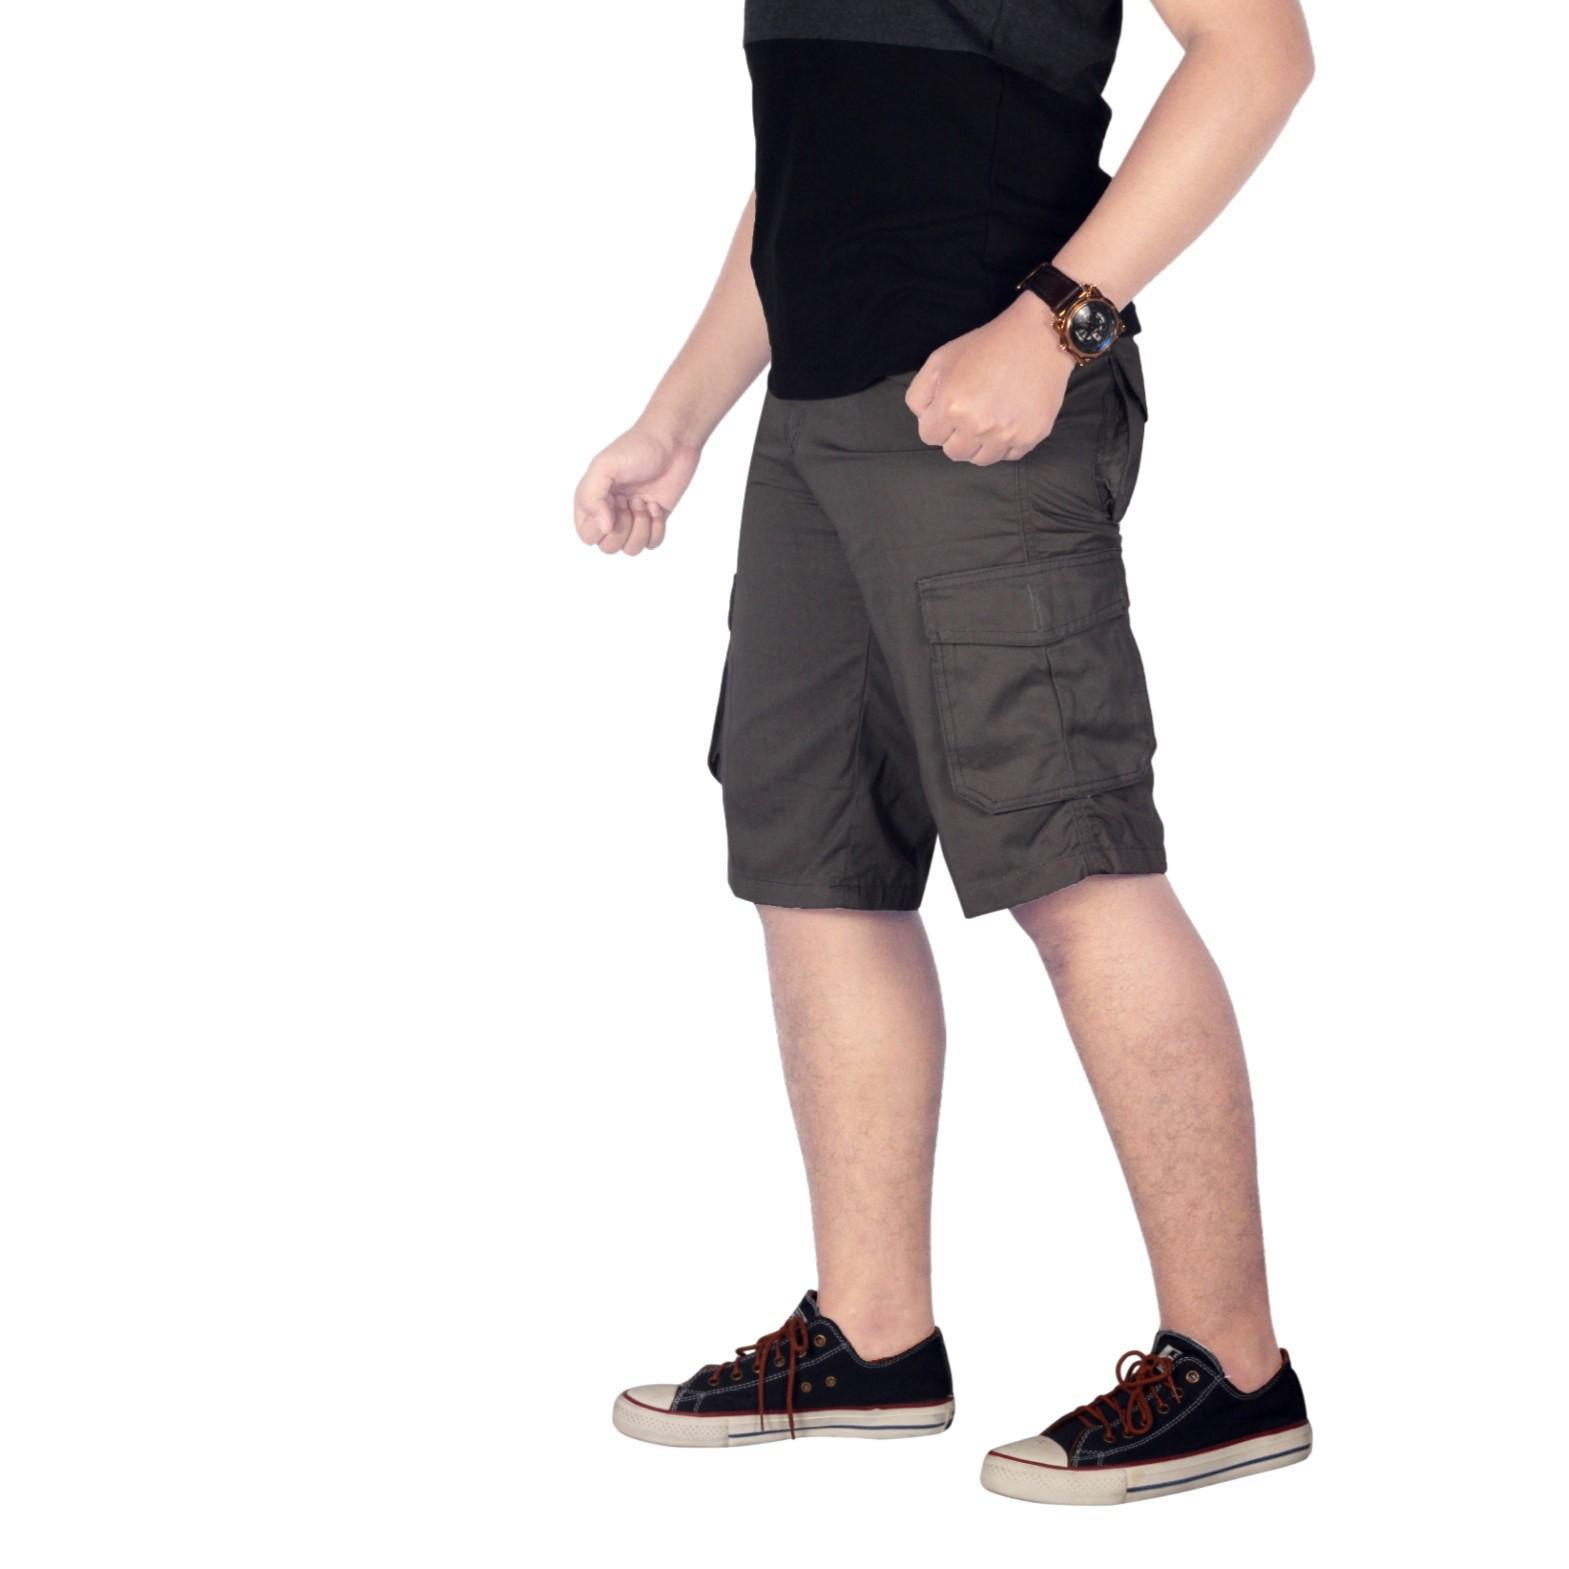 Bsg_Fashion1 Celana Pendek Hitam Polos Distro Import/ Celana Skinny/Celana Pants/Celana Santai/Celana Casual/Celana Motif/Celana Polos/Celana Pria/Celana Cino/Celana Pantai/Celana Denim/Celana Jeans / CELENA ARMY / CELANA JEANS KARGO /CELANA KARGO AN 5693